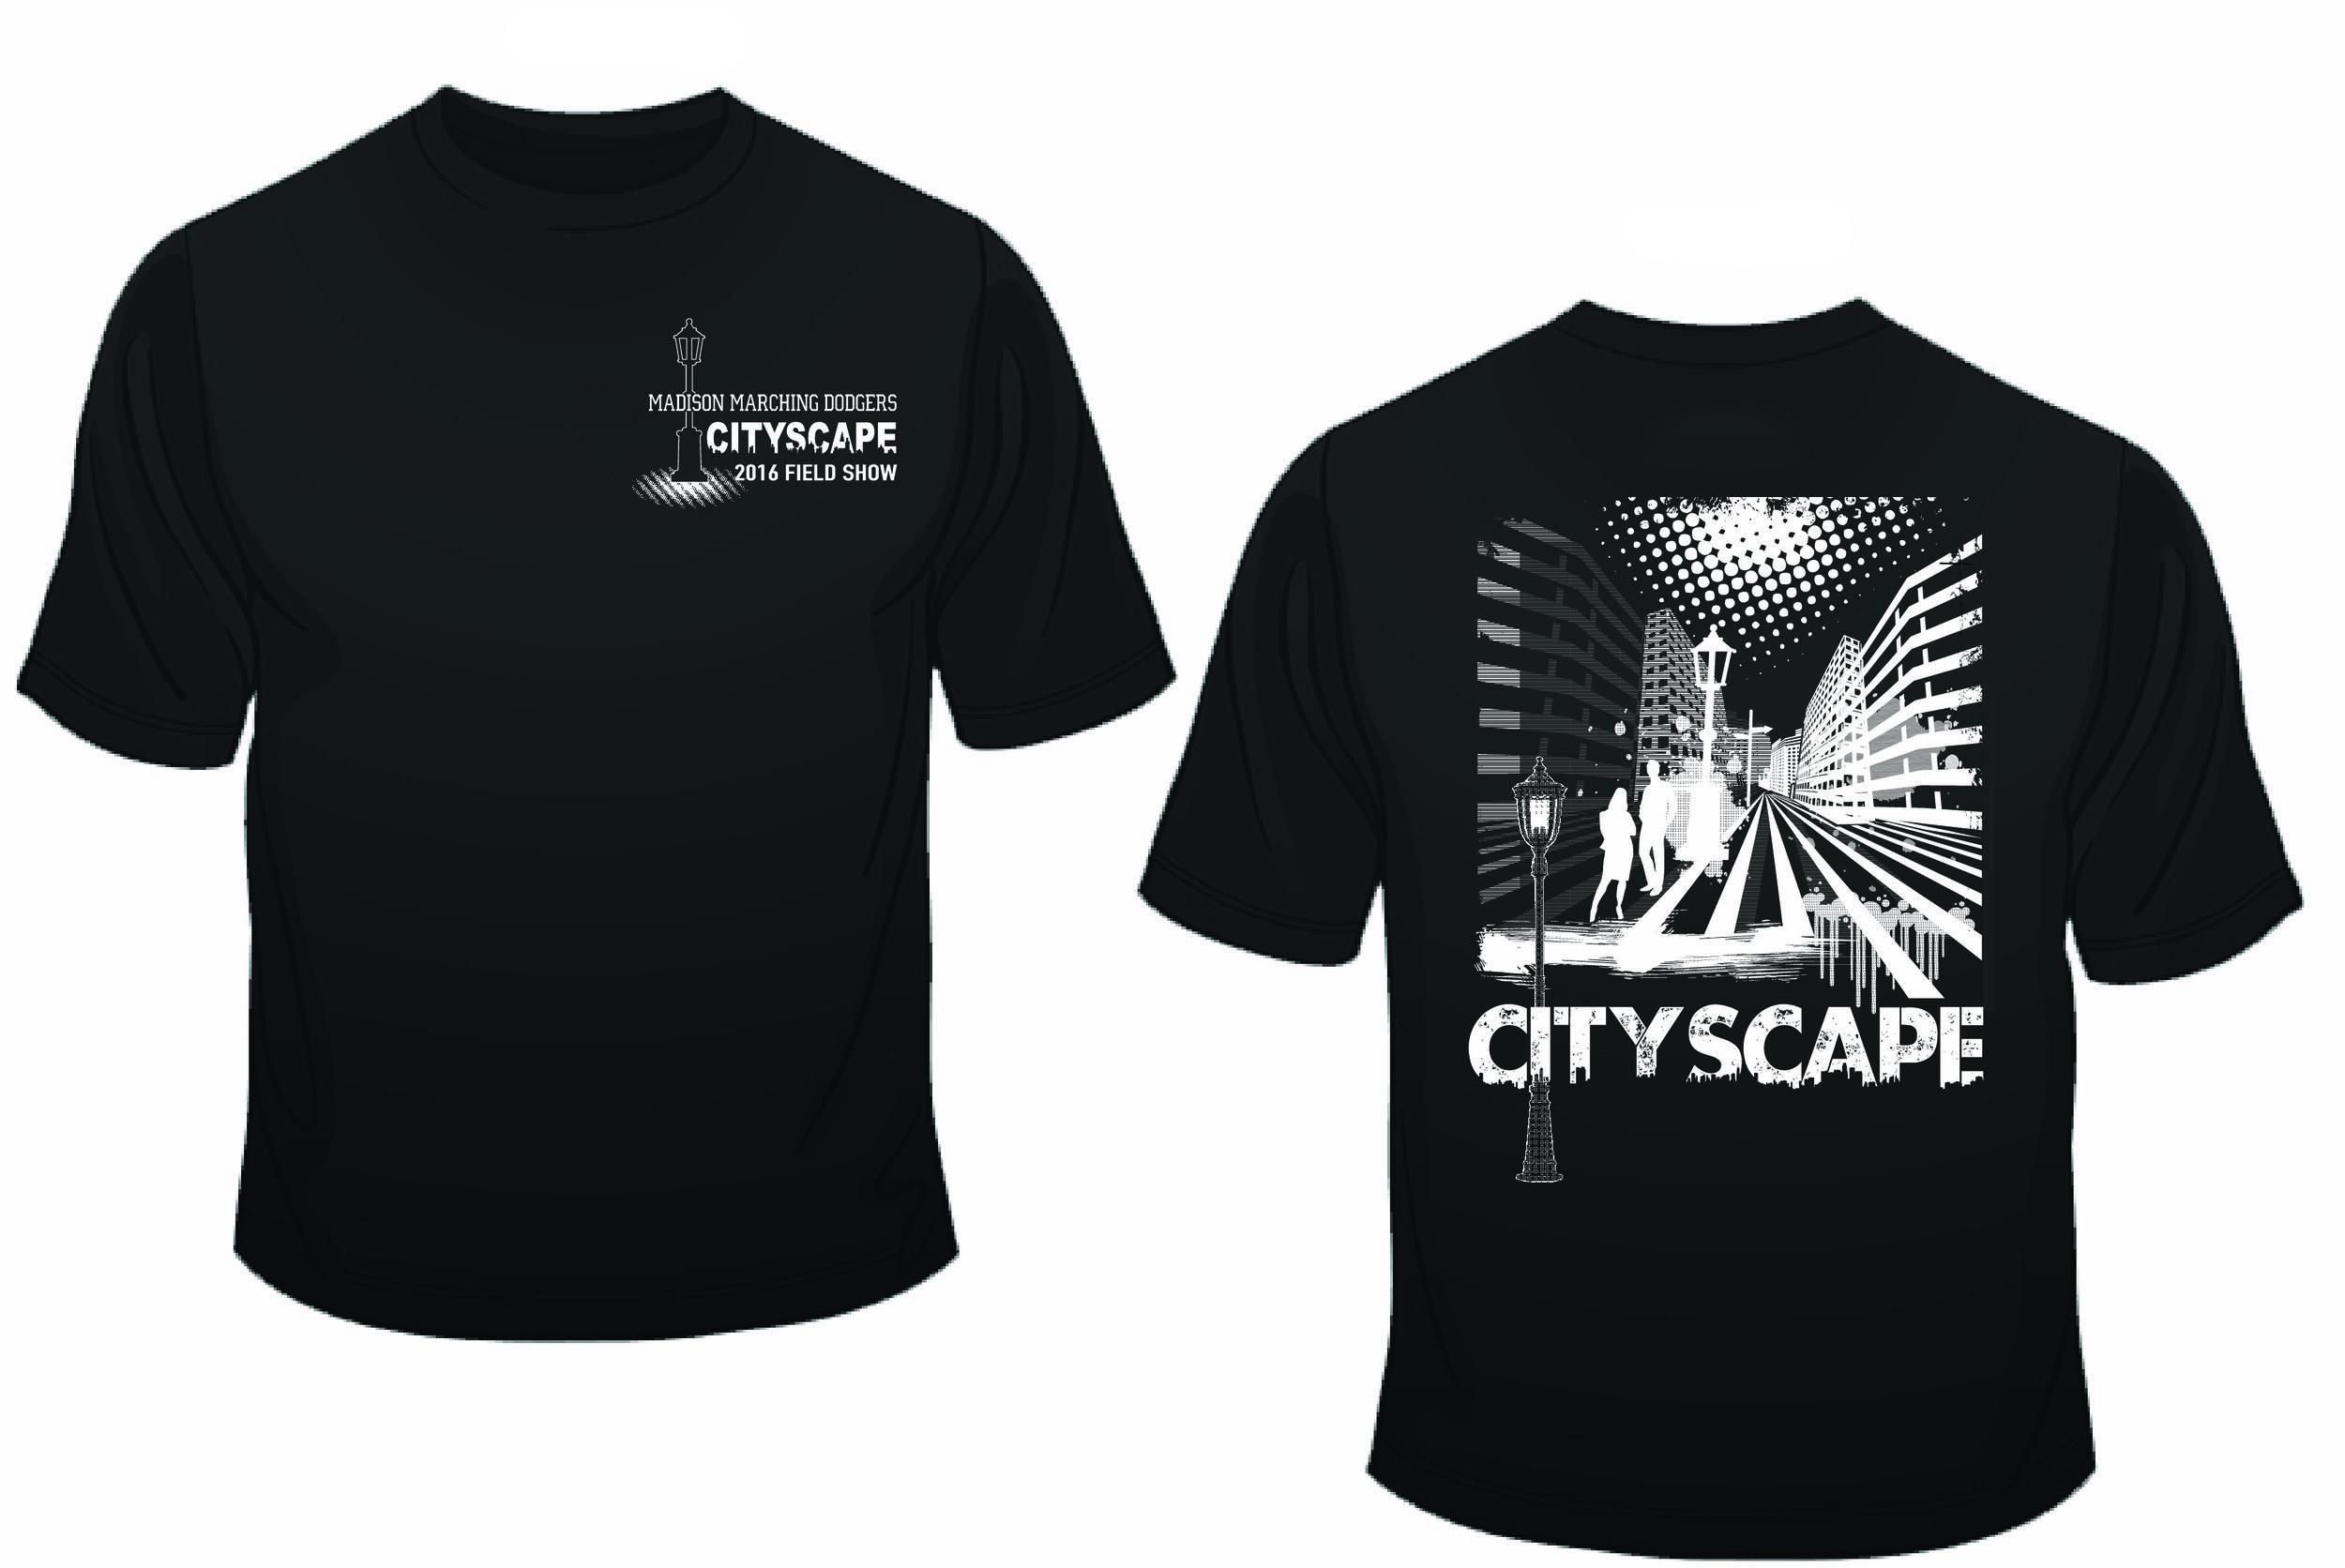 cityscape_tshirt_final2.jpg